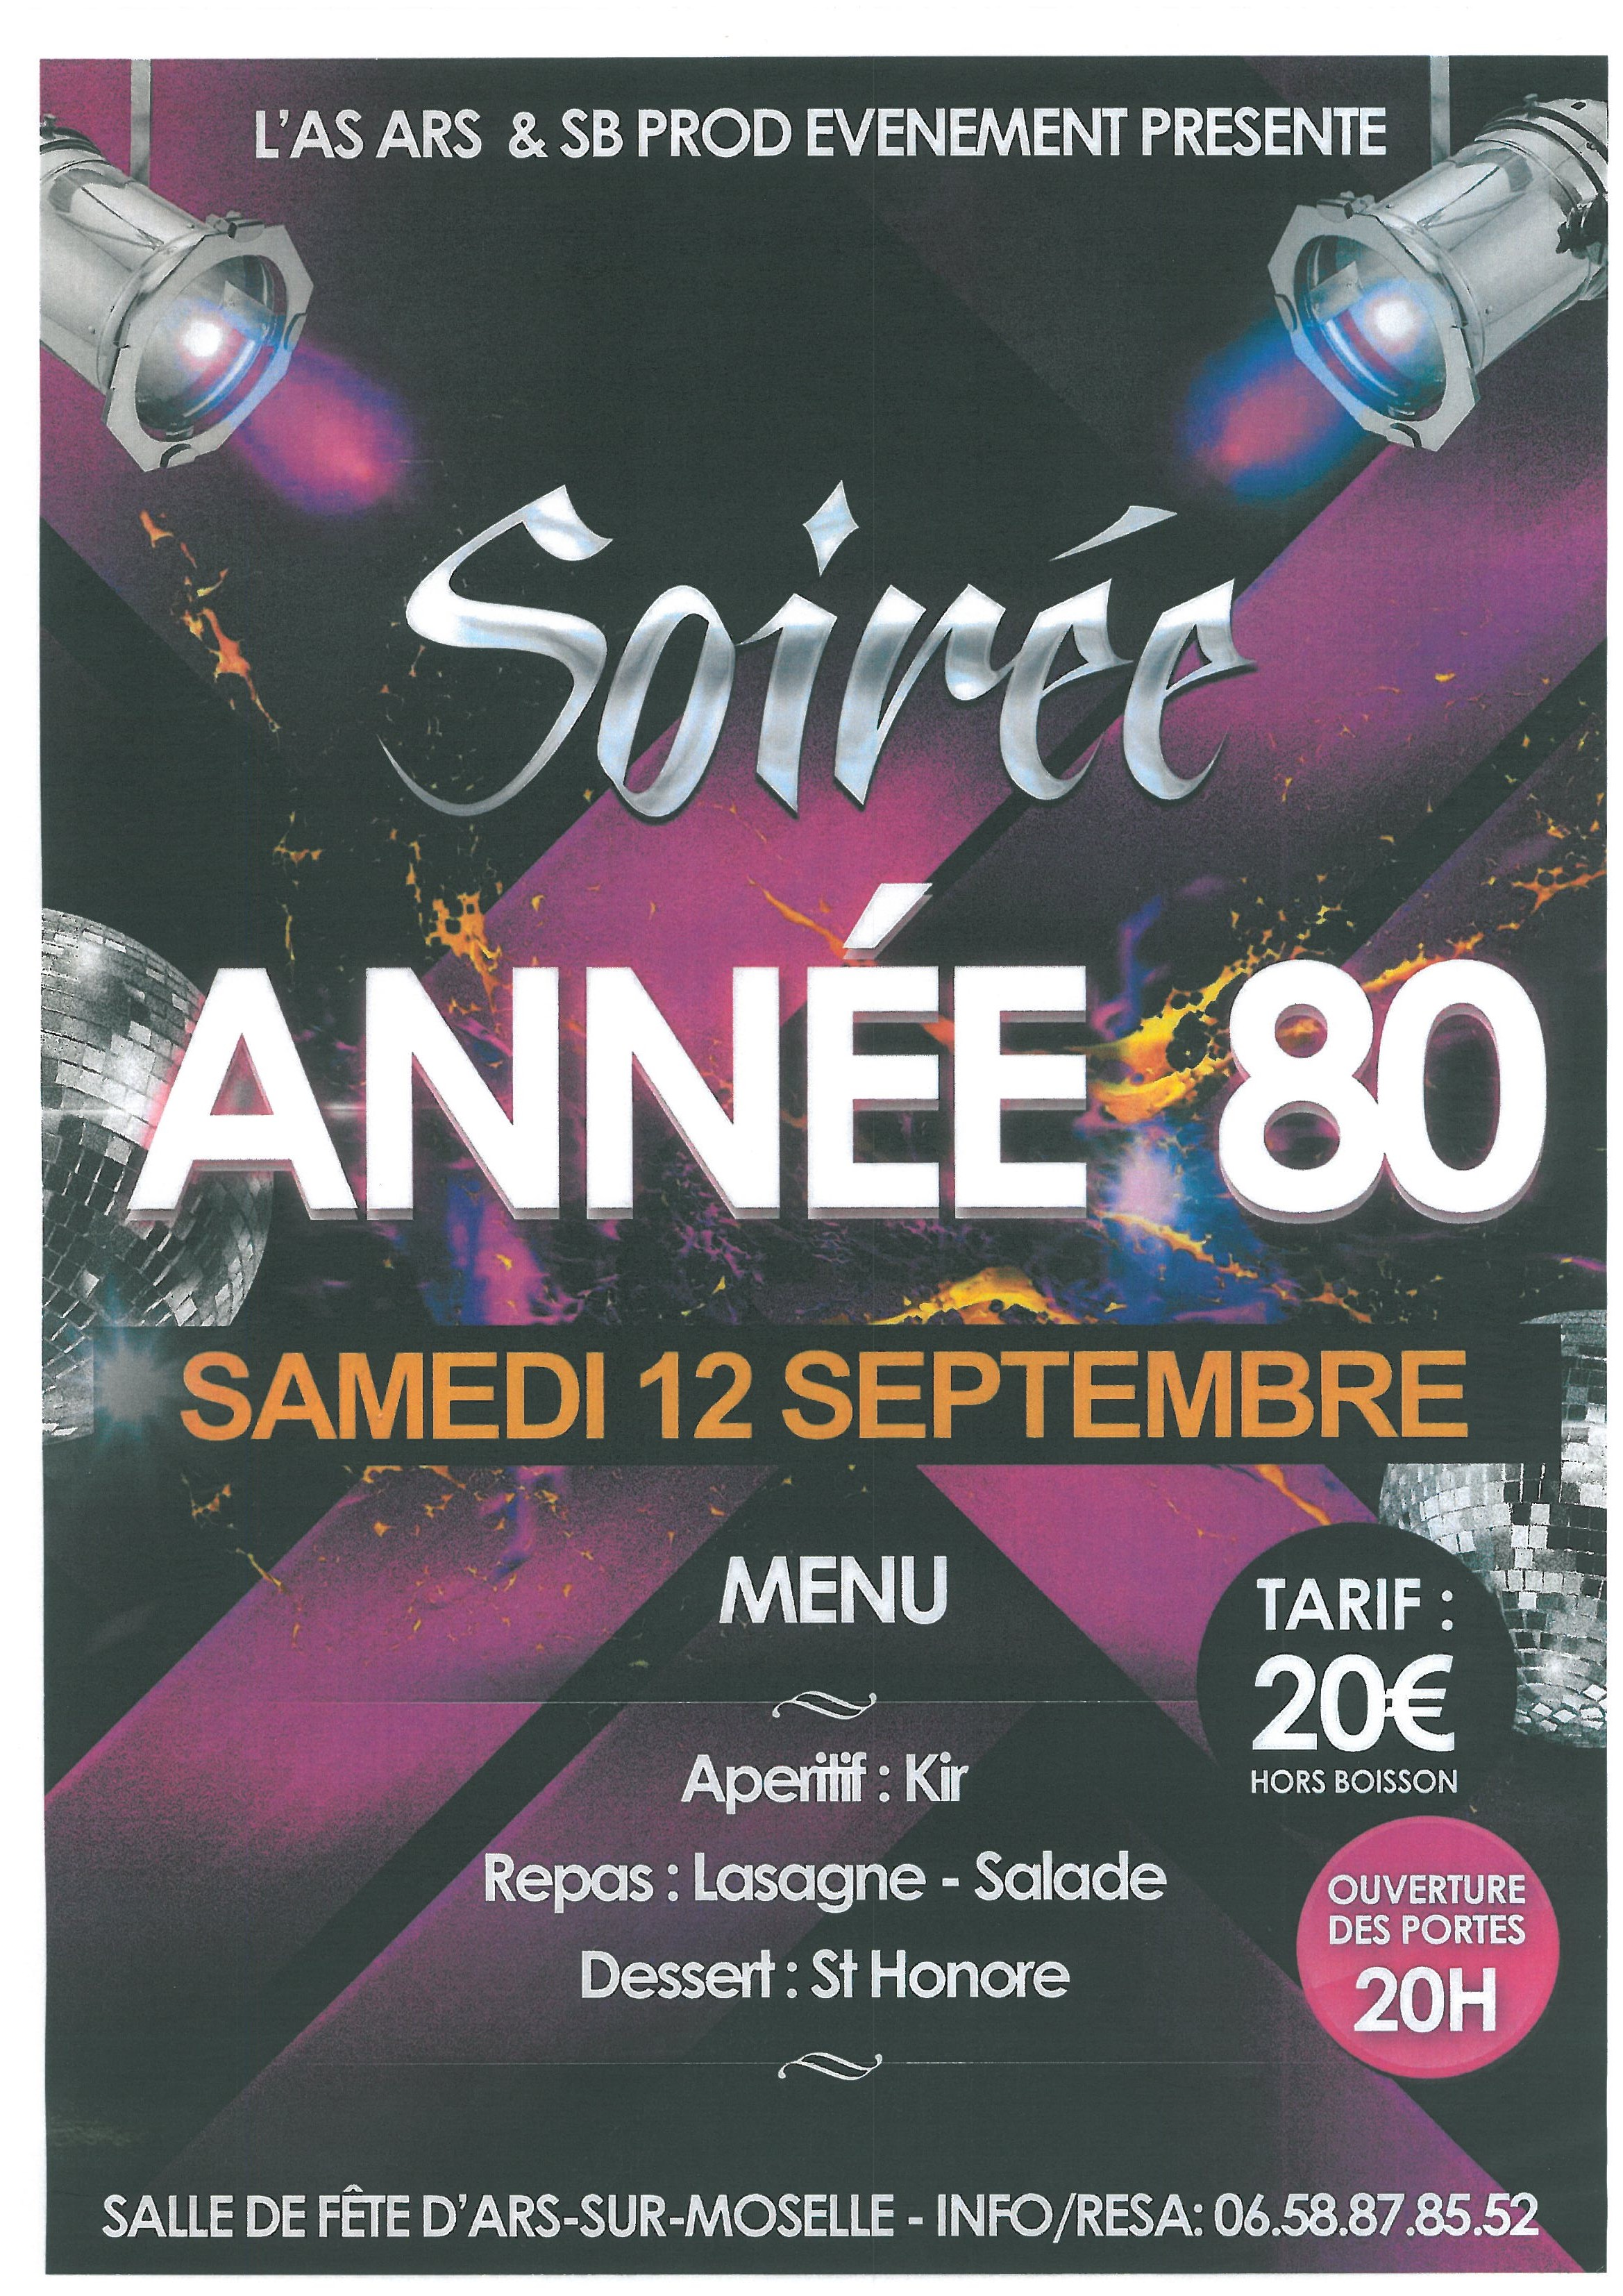 SOIREE ANNEE 80 samedi 12 septembre